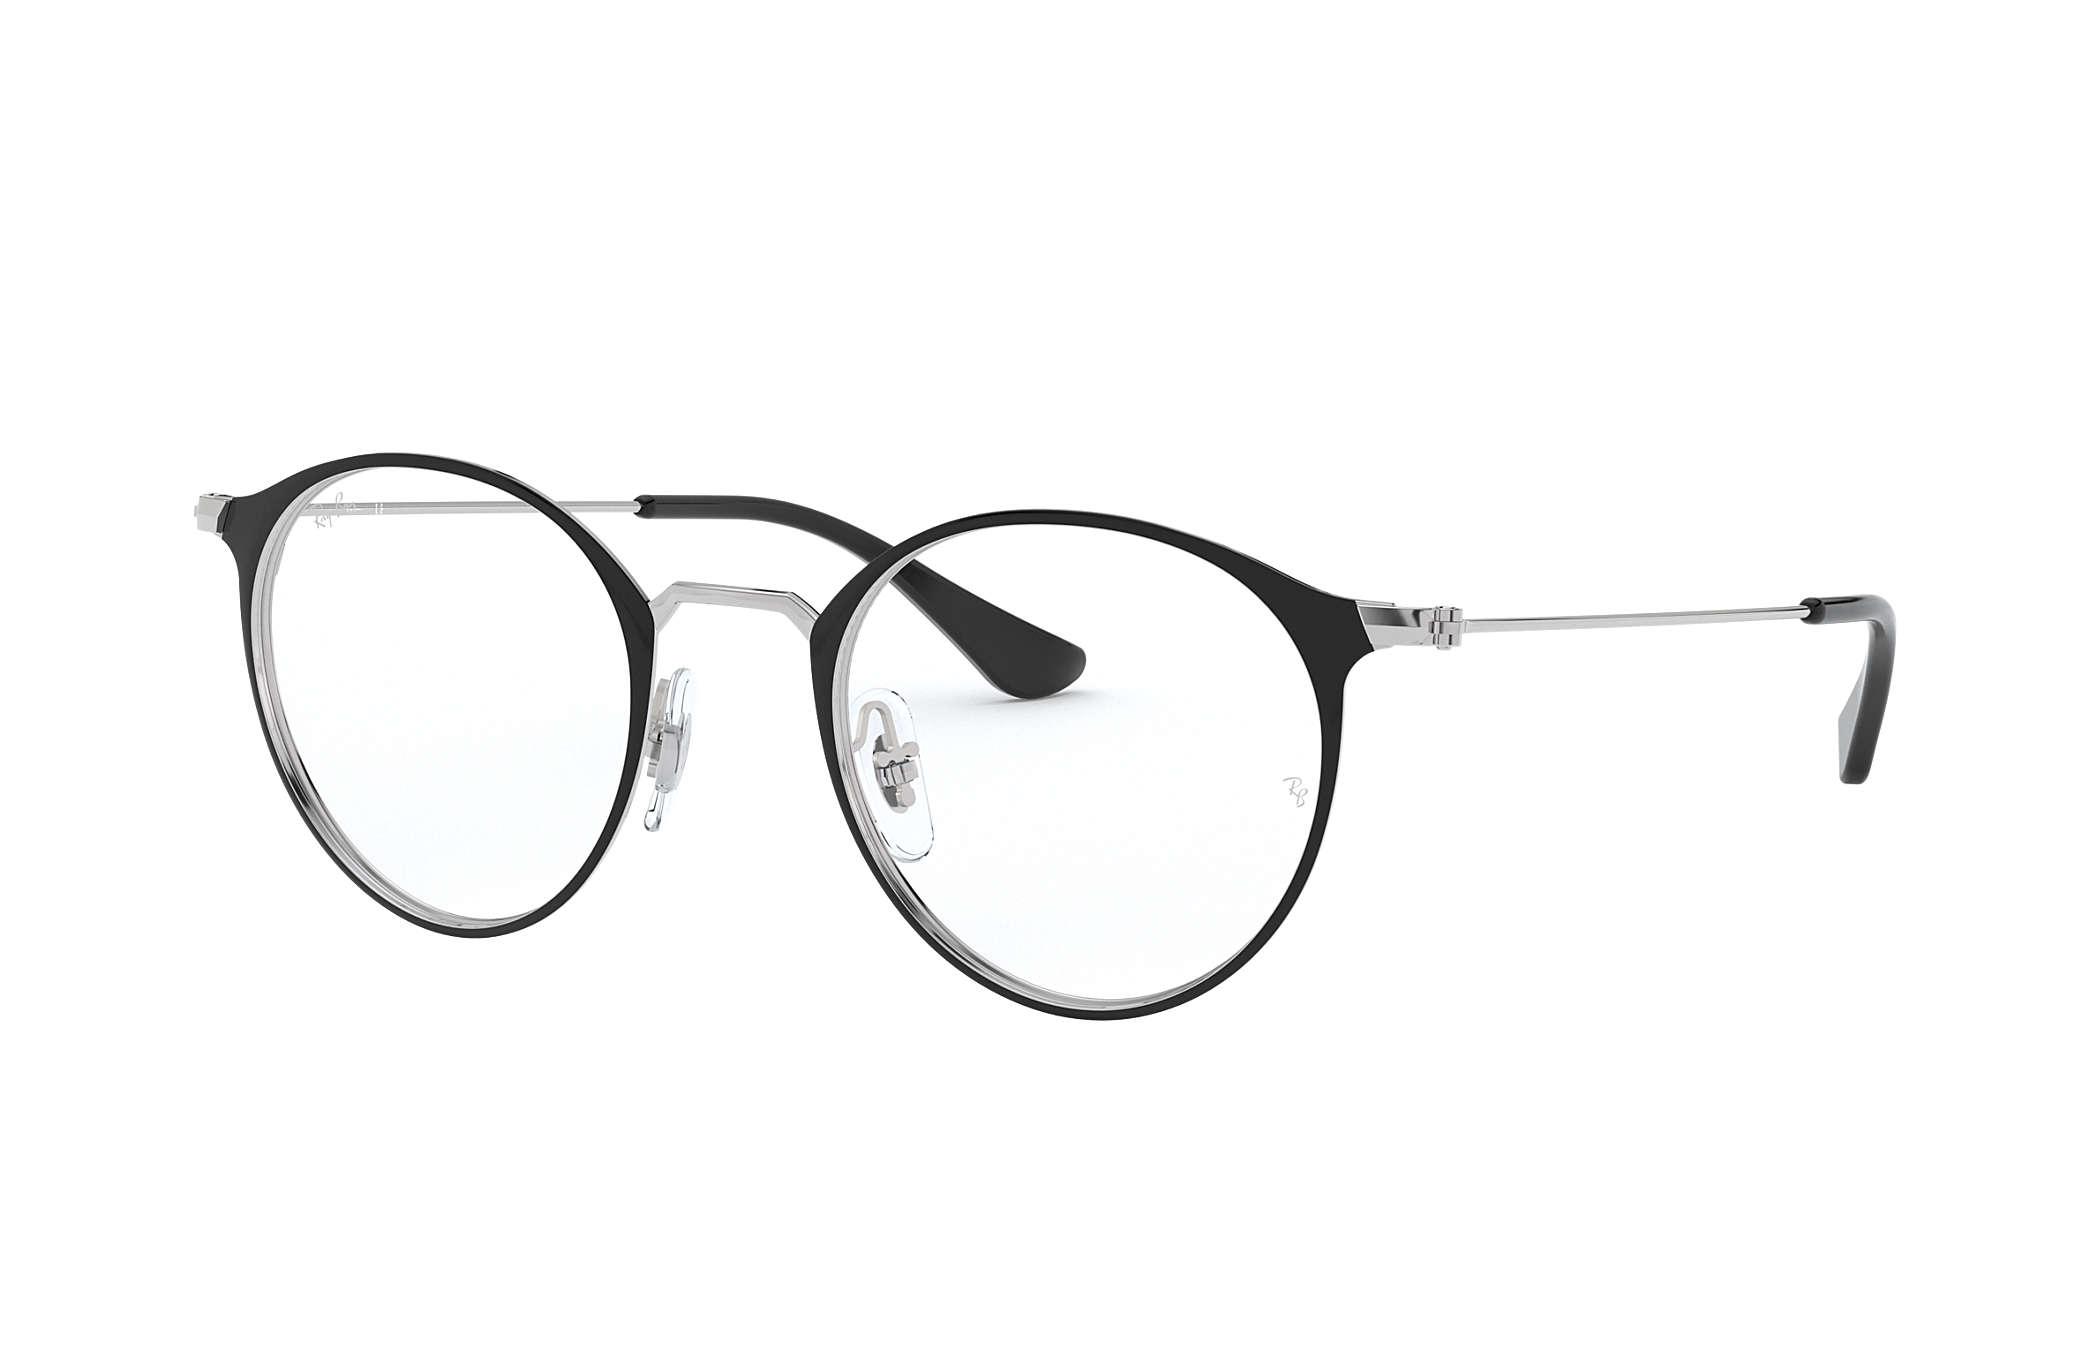 9acf8939e1e Ray-Ban eyeglasses RB6378 Black - Metal - 0RX6378286147